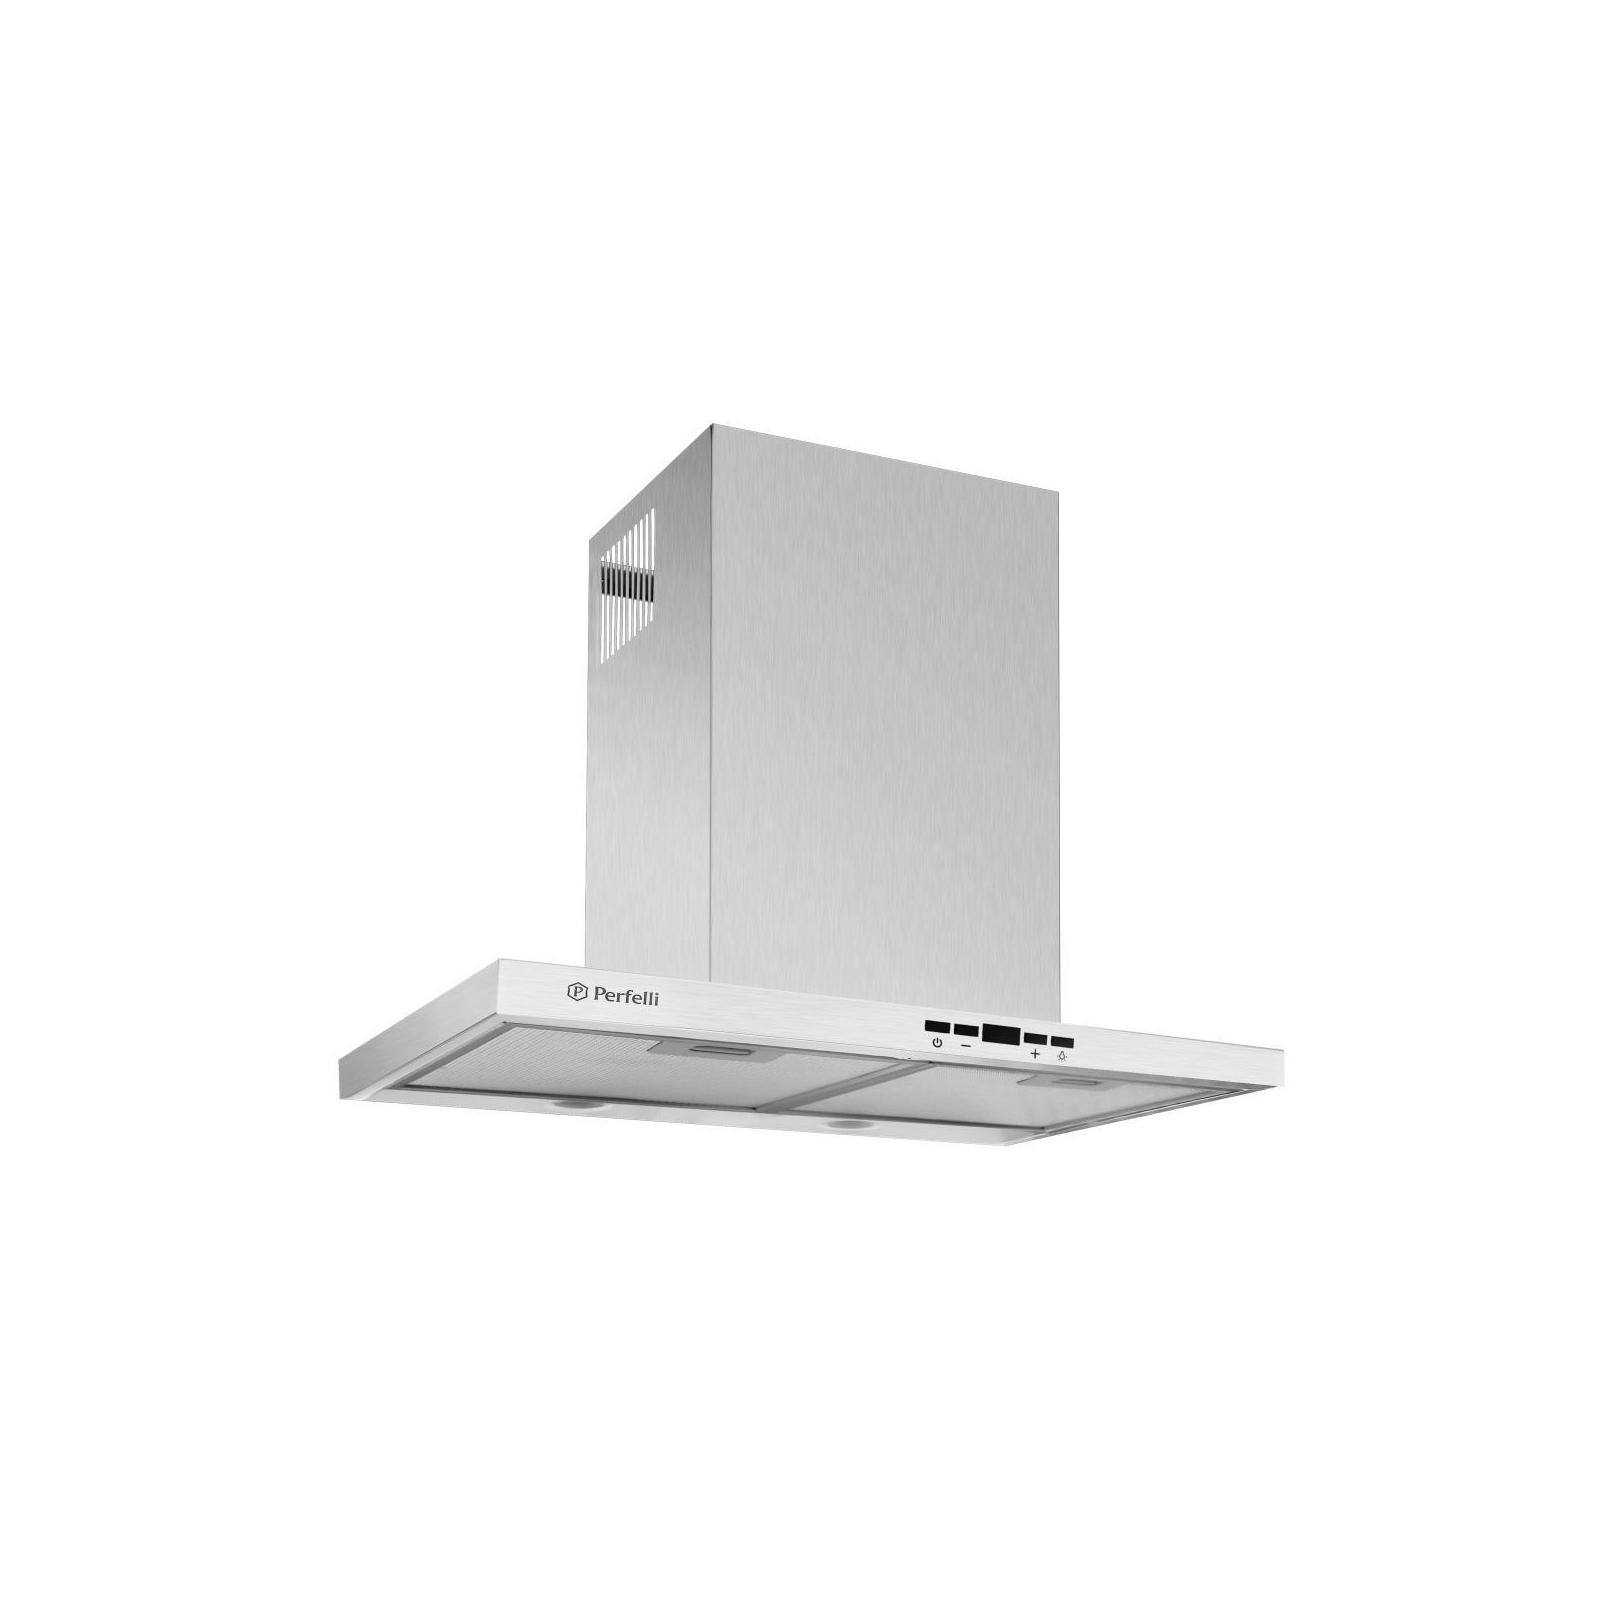 Вытяжка кухонная PERFELLI TET 6612 A 1000 I LED изображение 2